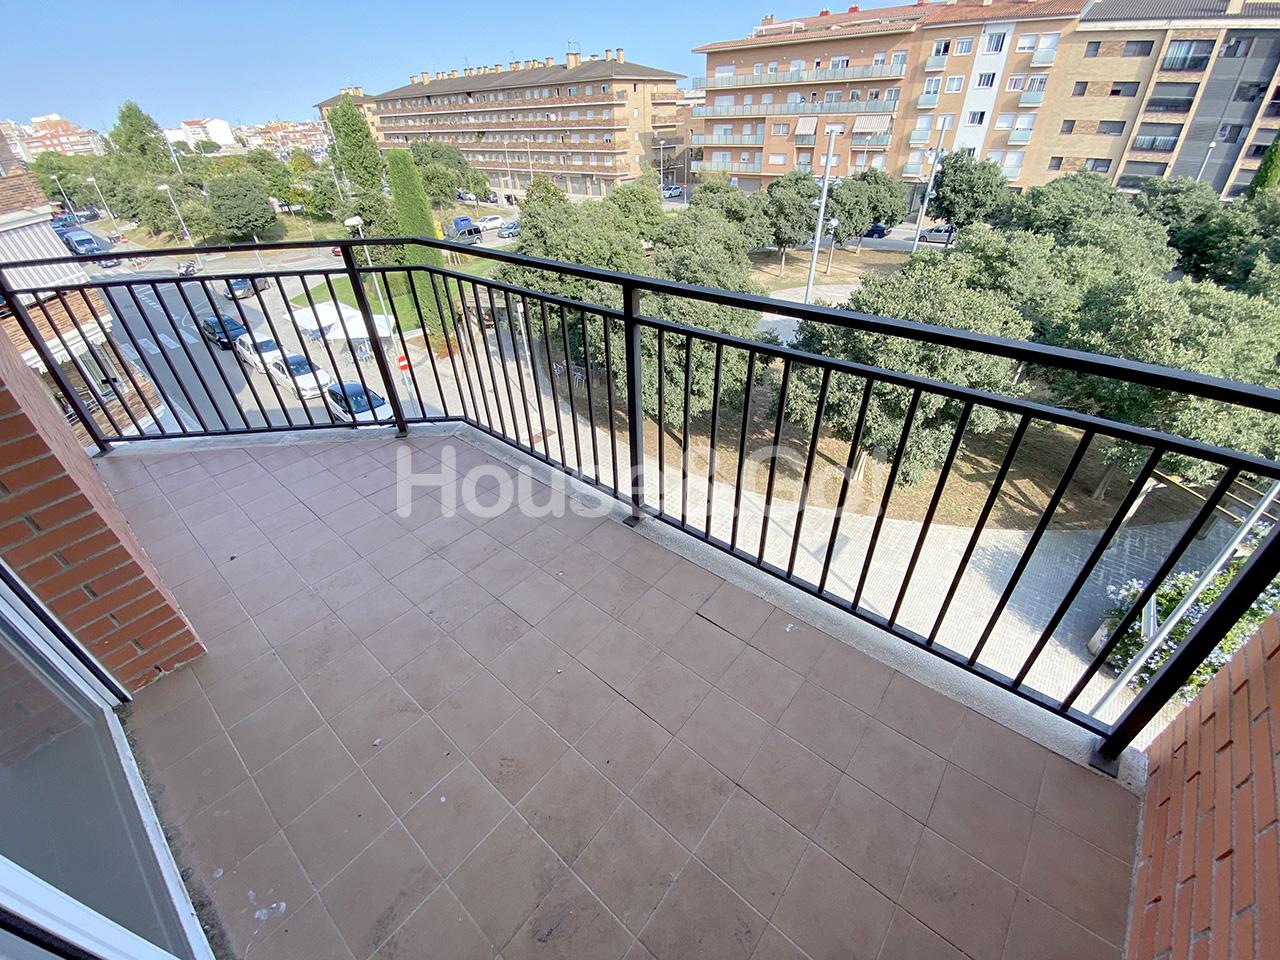 Piso  Zona paisos catalans. Piso de 2 dormitorios sin estrenar.